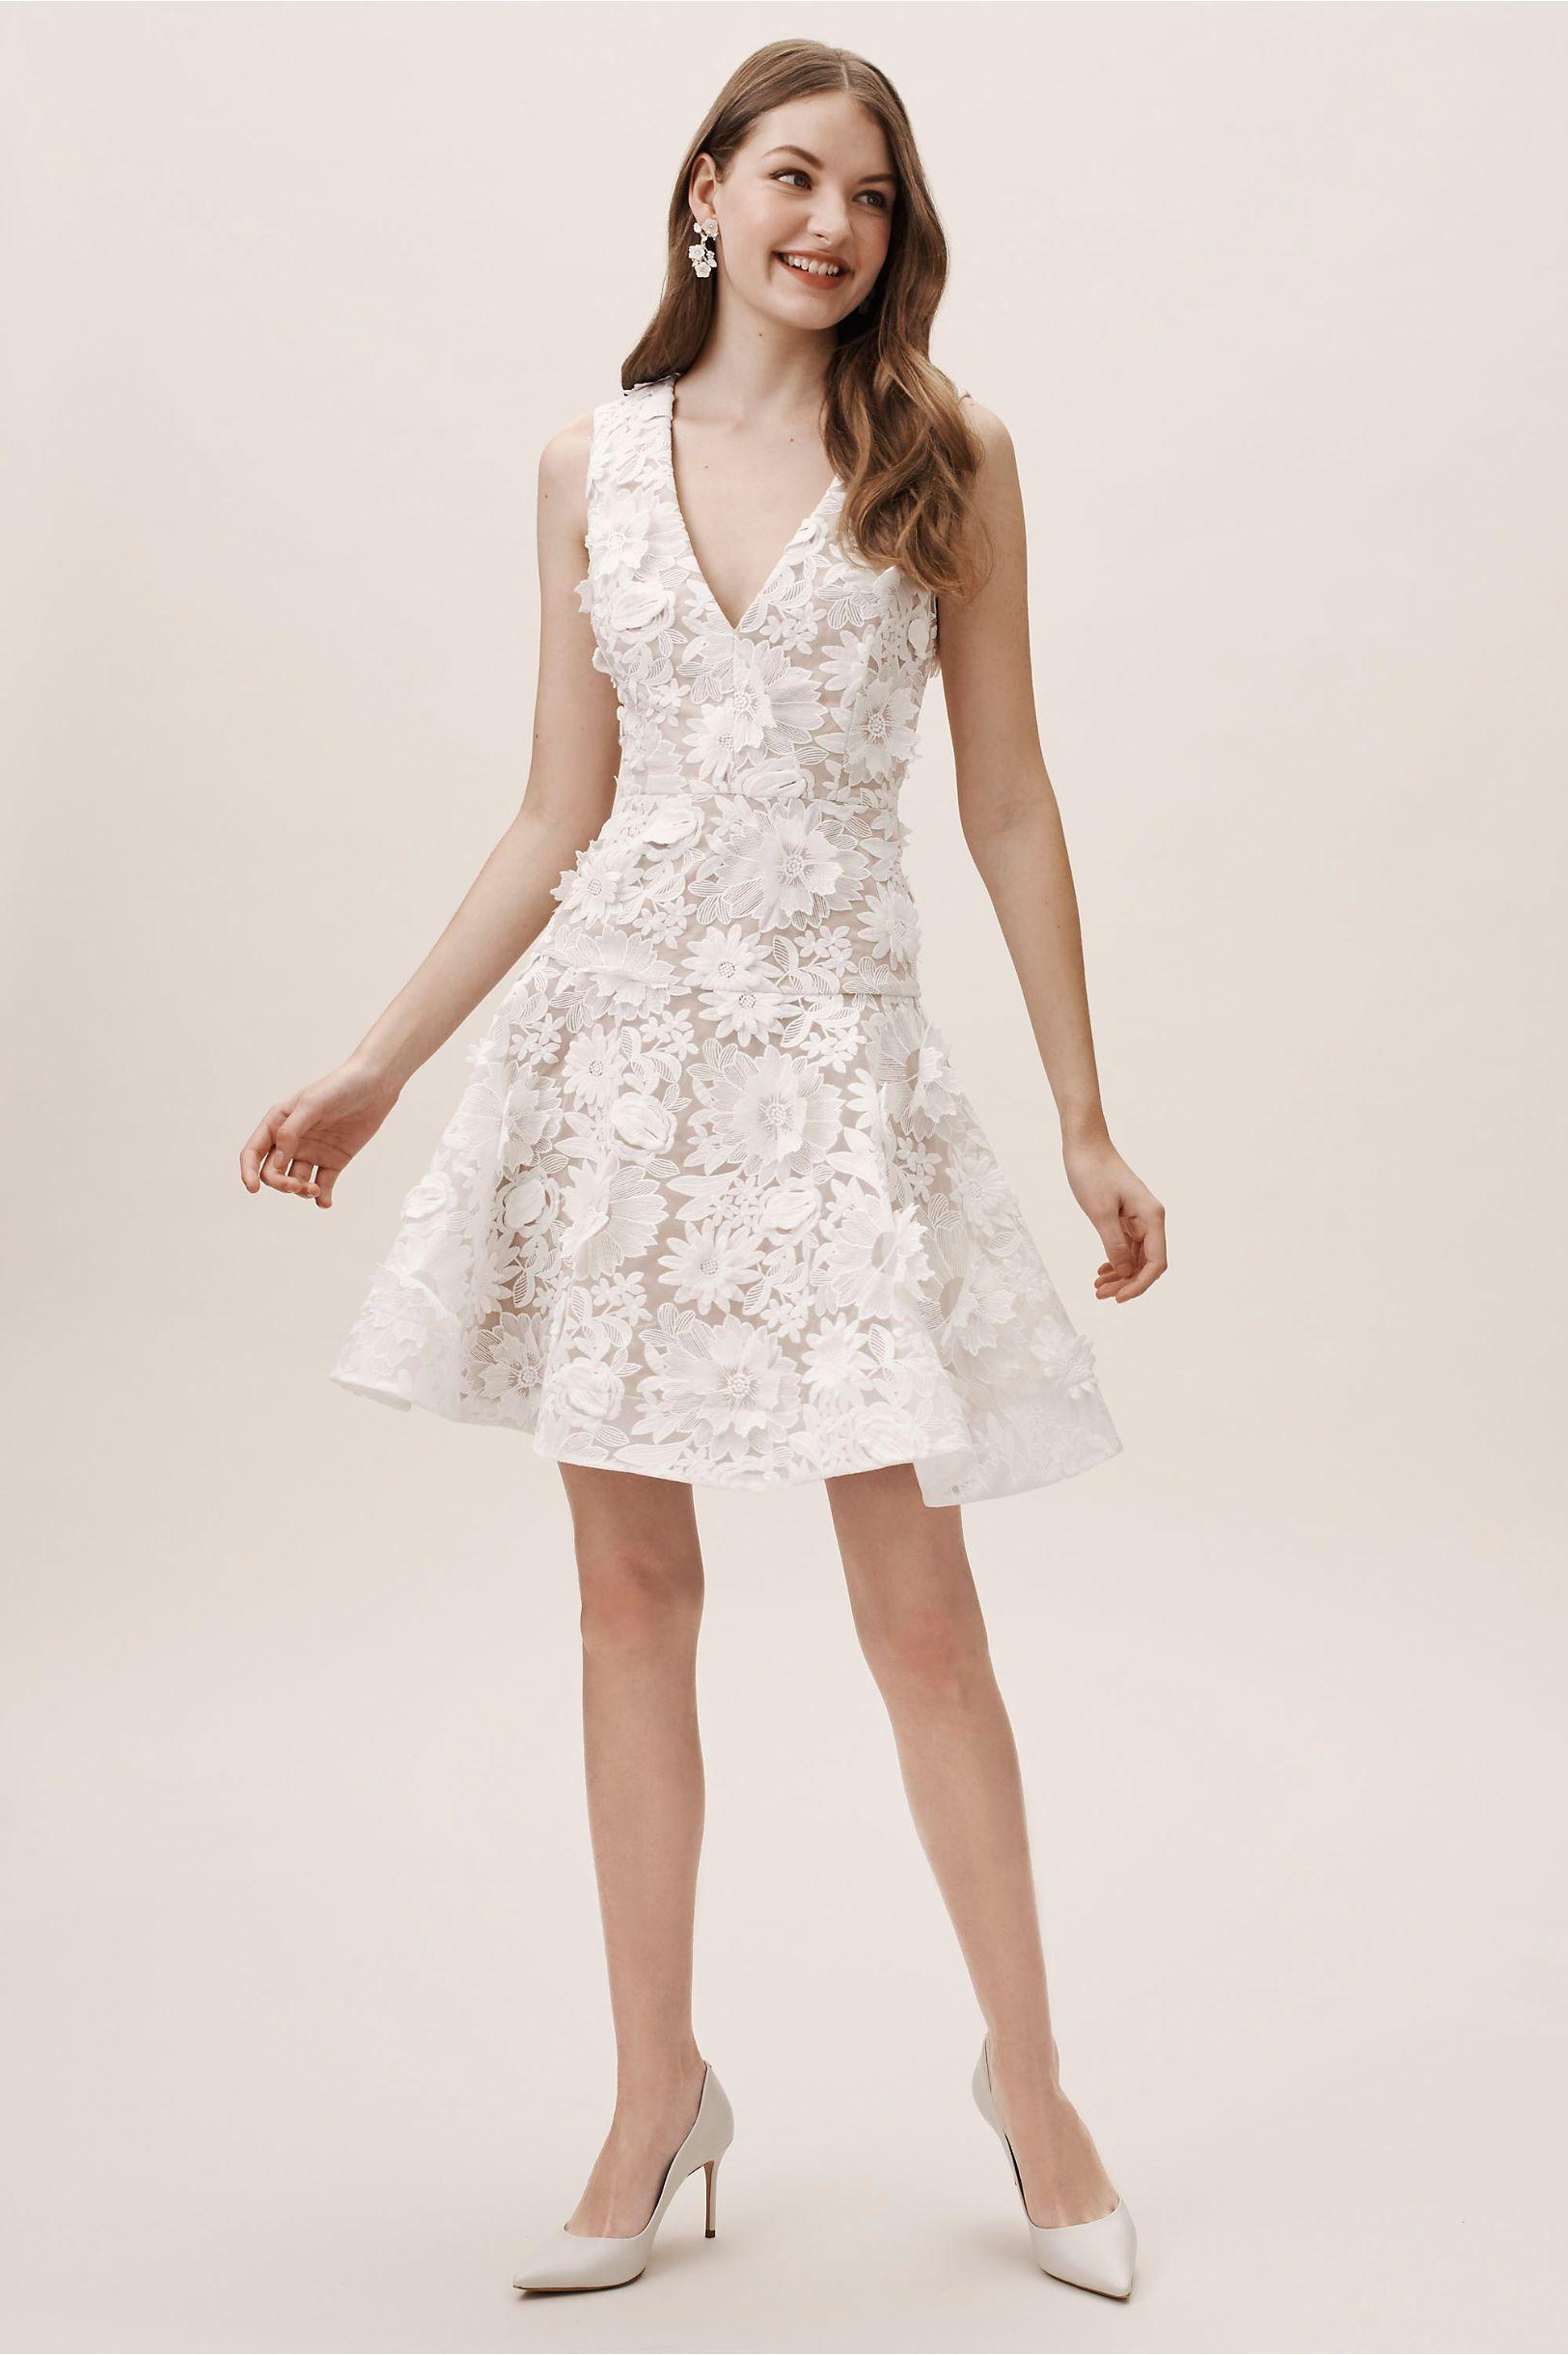 Bhldn Melbourne Dress Short Wedding Dress Casual Wedding Dress Wedding Dress Sizes